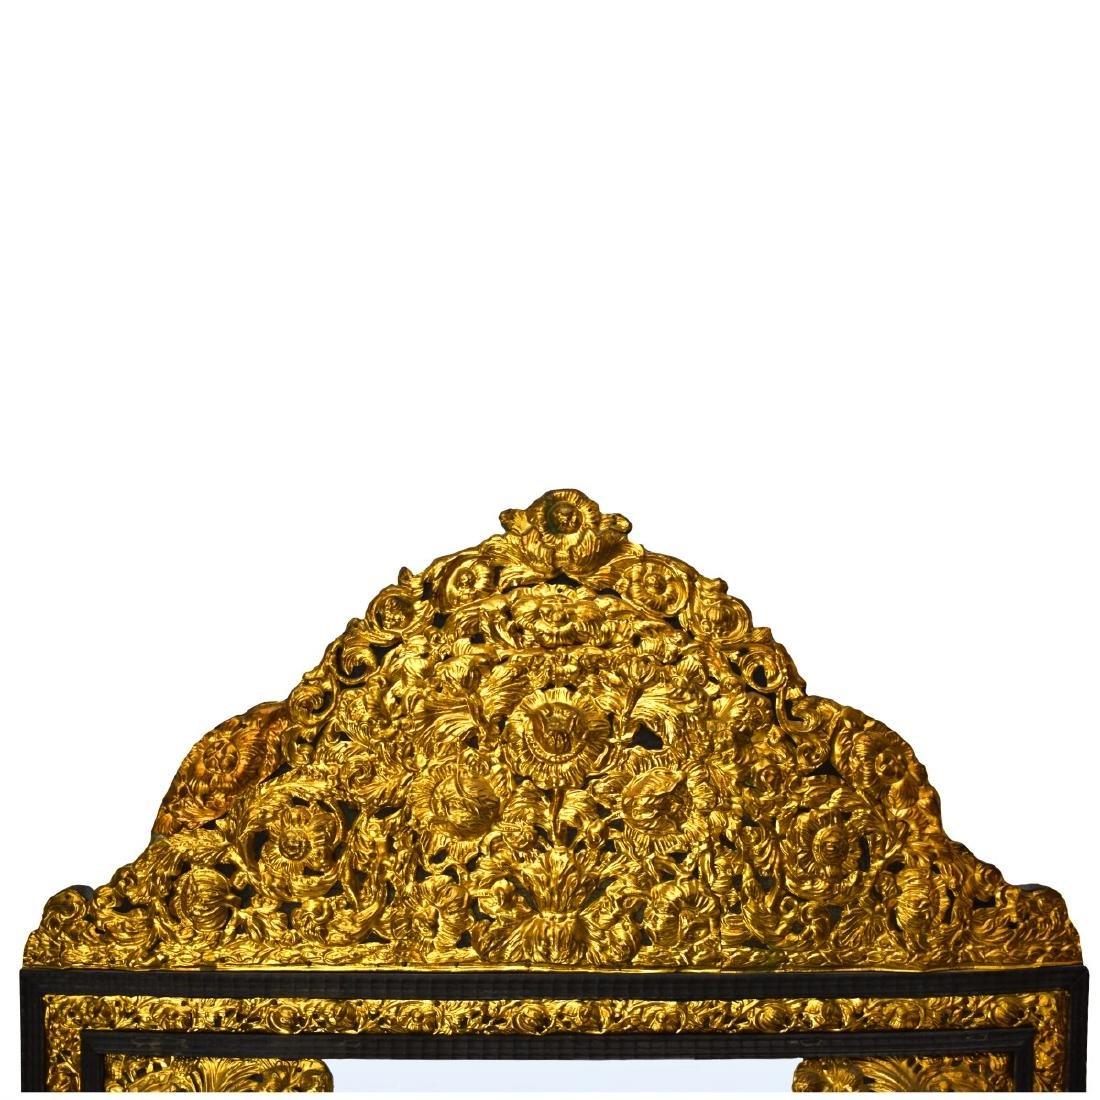 Large French Napoleon II Style Cushion Mirror - 3